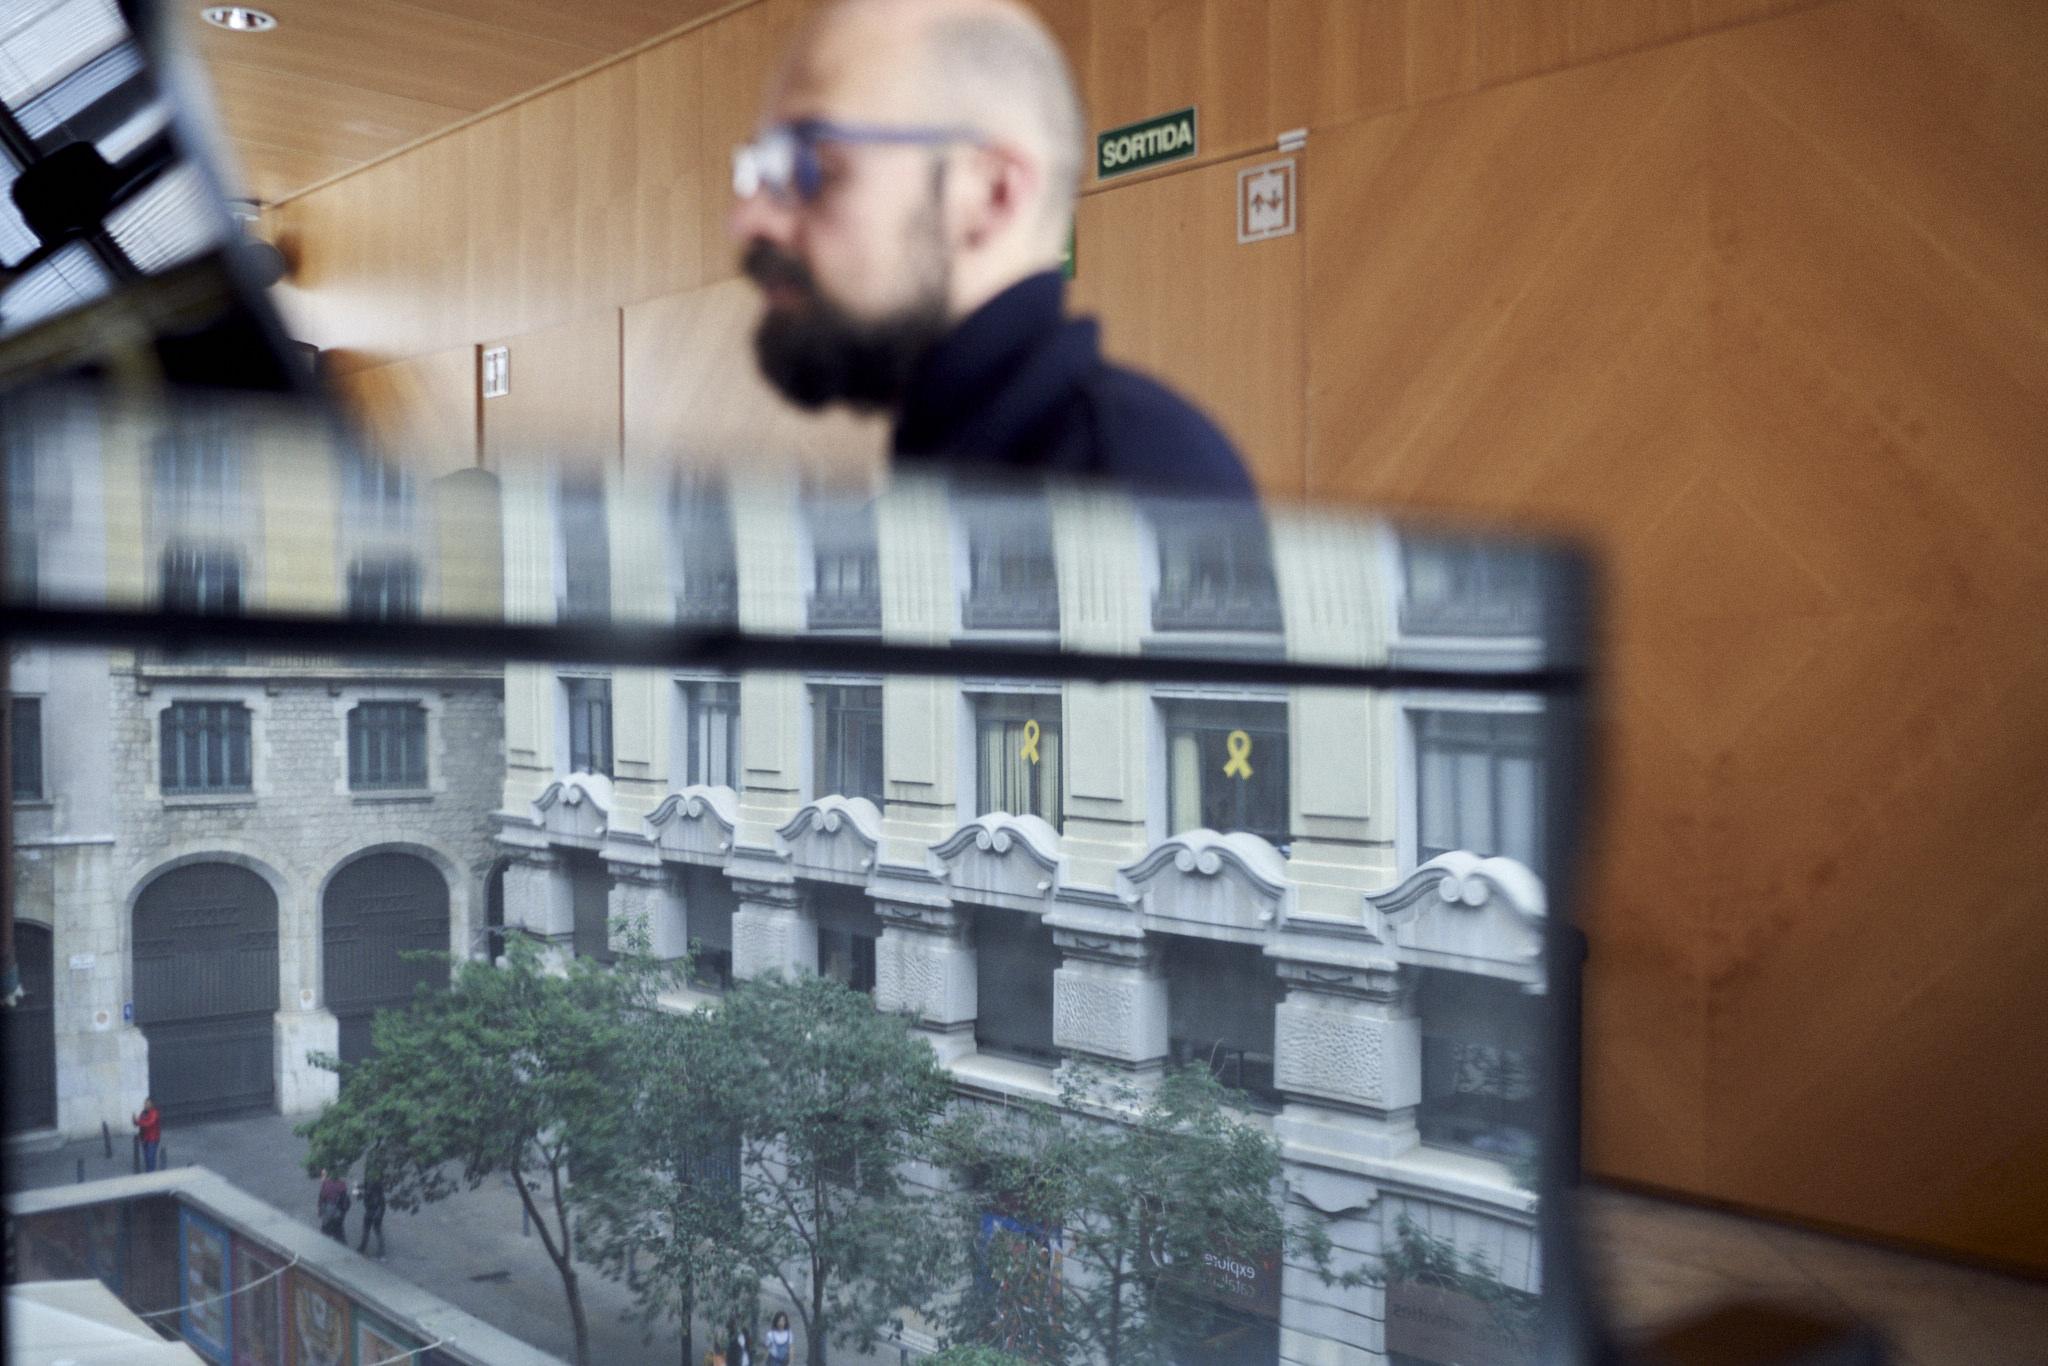 Fotografo de Musicos Barcelona _LME3731.jpg